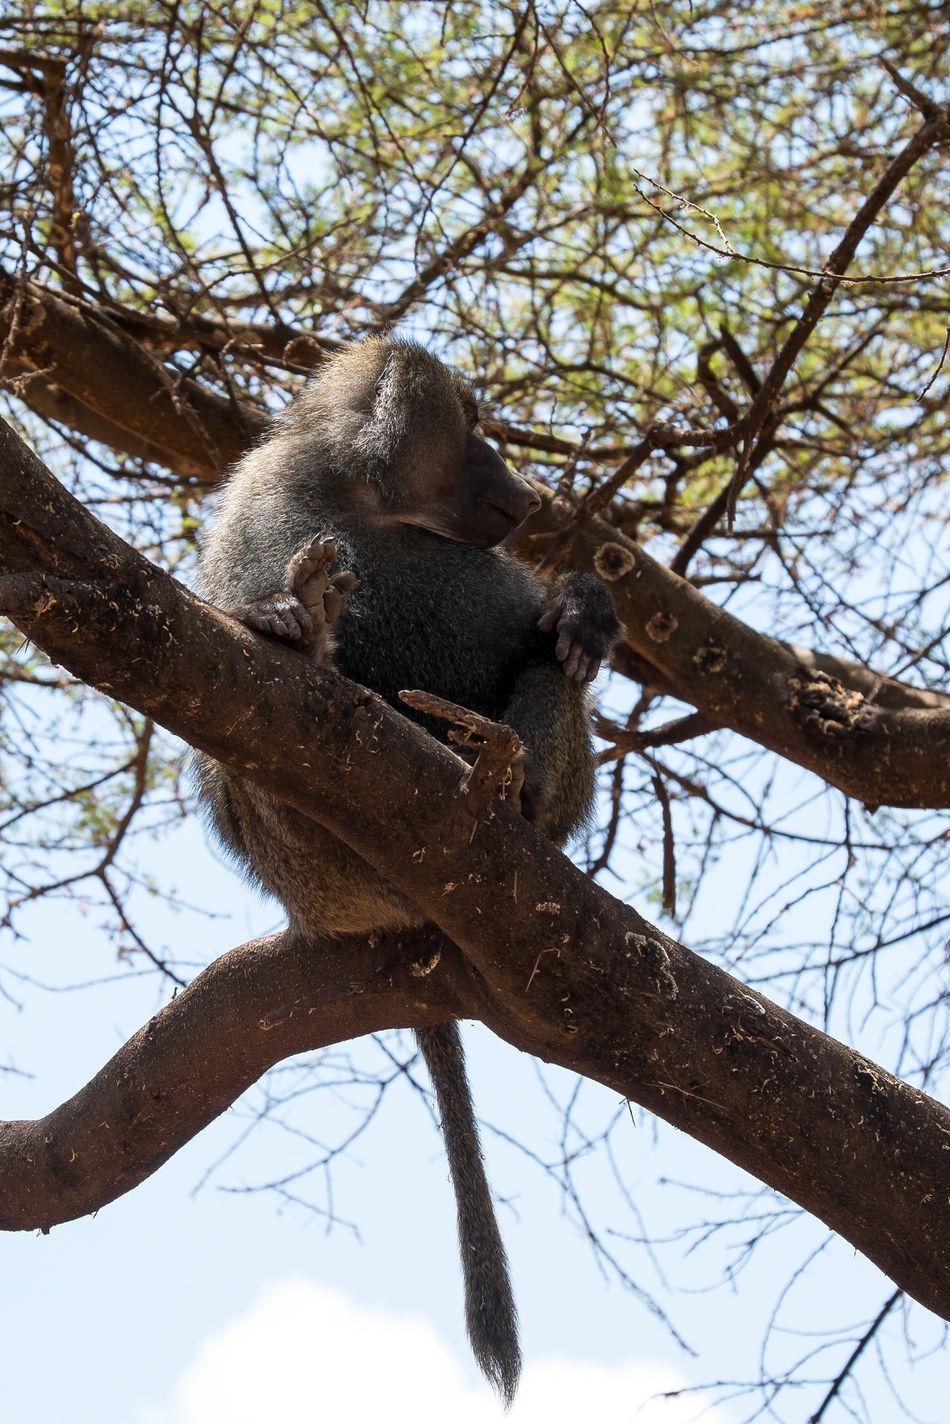 Animals In The Wild FUJIFILM X-T1 EyeEmNewHere Tansania Tanzania Lake Manyara Africa Affen Affe Olive Baboon Baboon Paviane Anubispavian Animal Wildlife